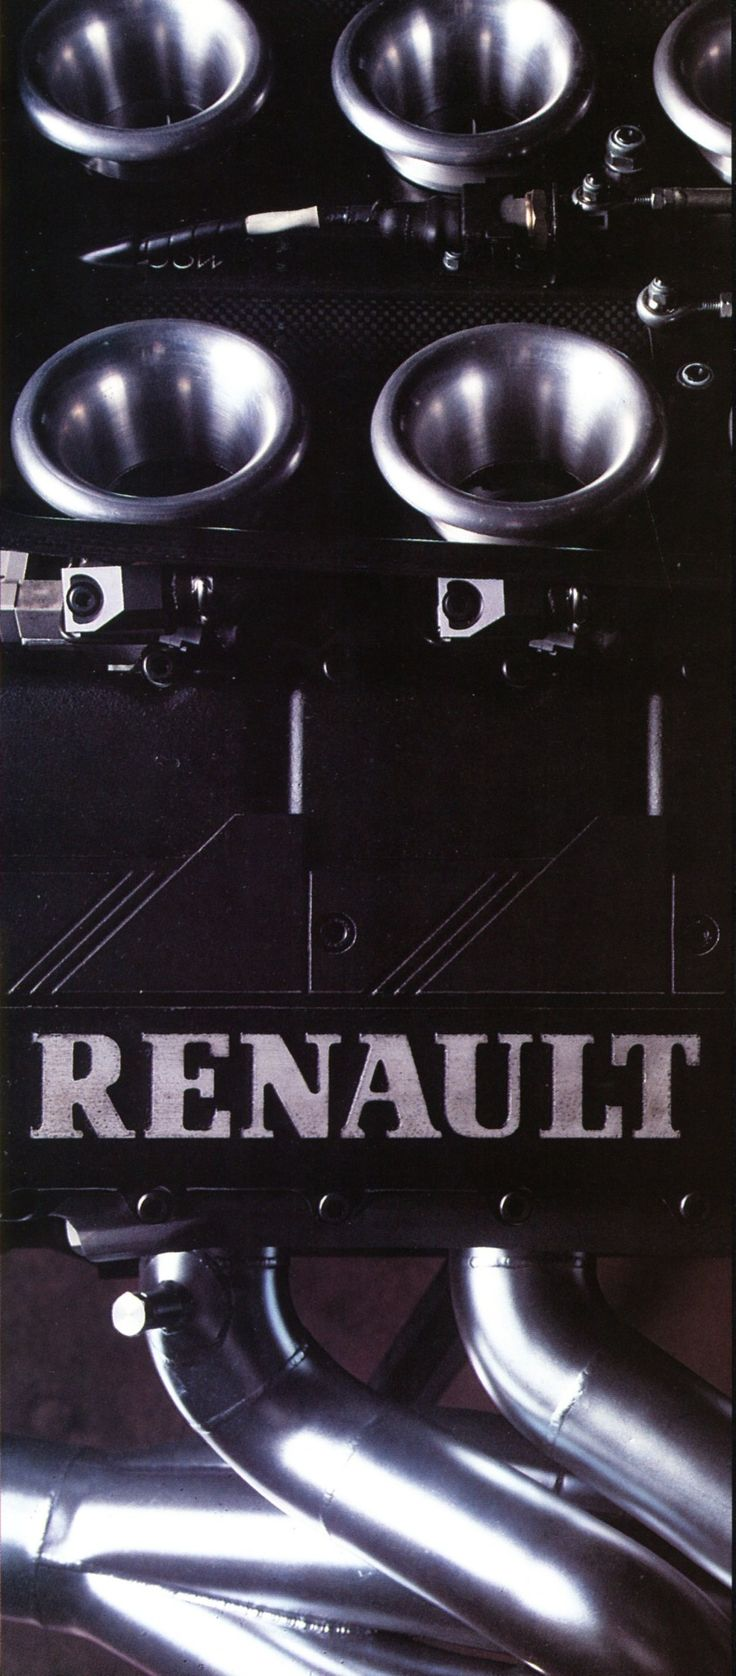 Renault golden age lifestyle french engine automobile sport wheels formula 1